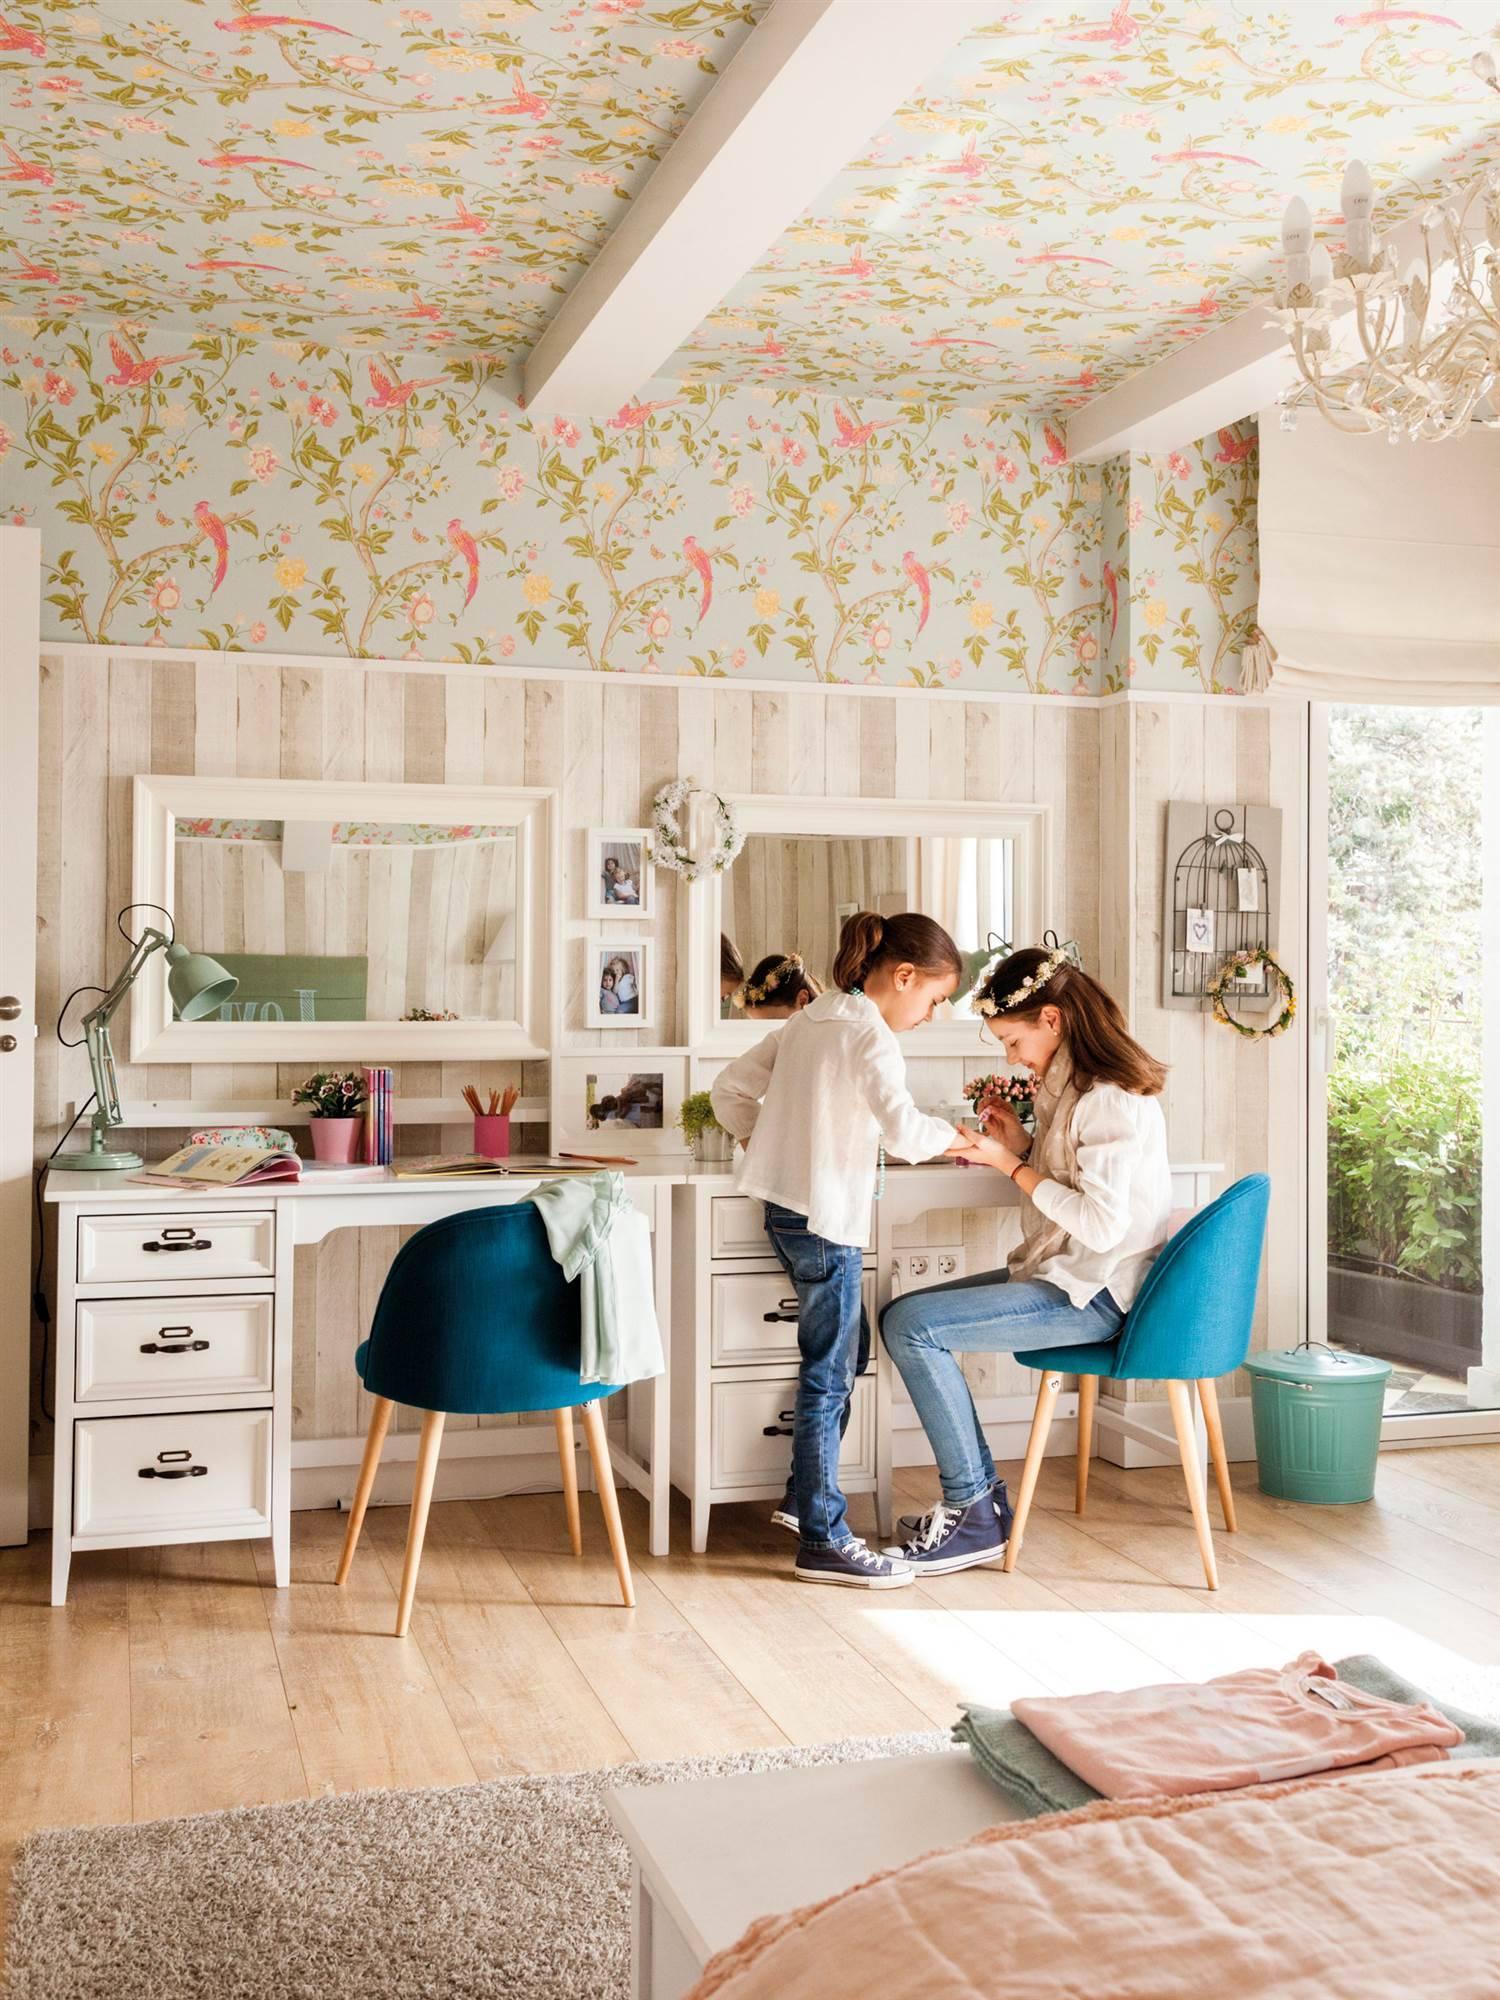 Habitaciones infantiles y juveniles ideas de decoraci n - Vtv muebles infantiles ...